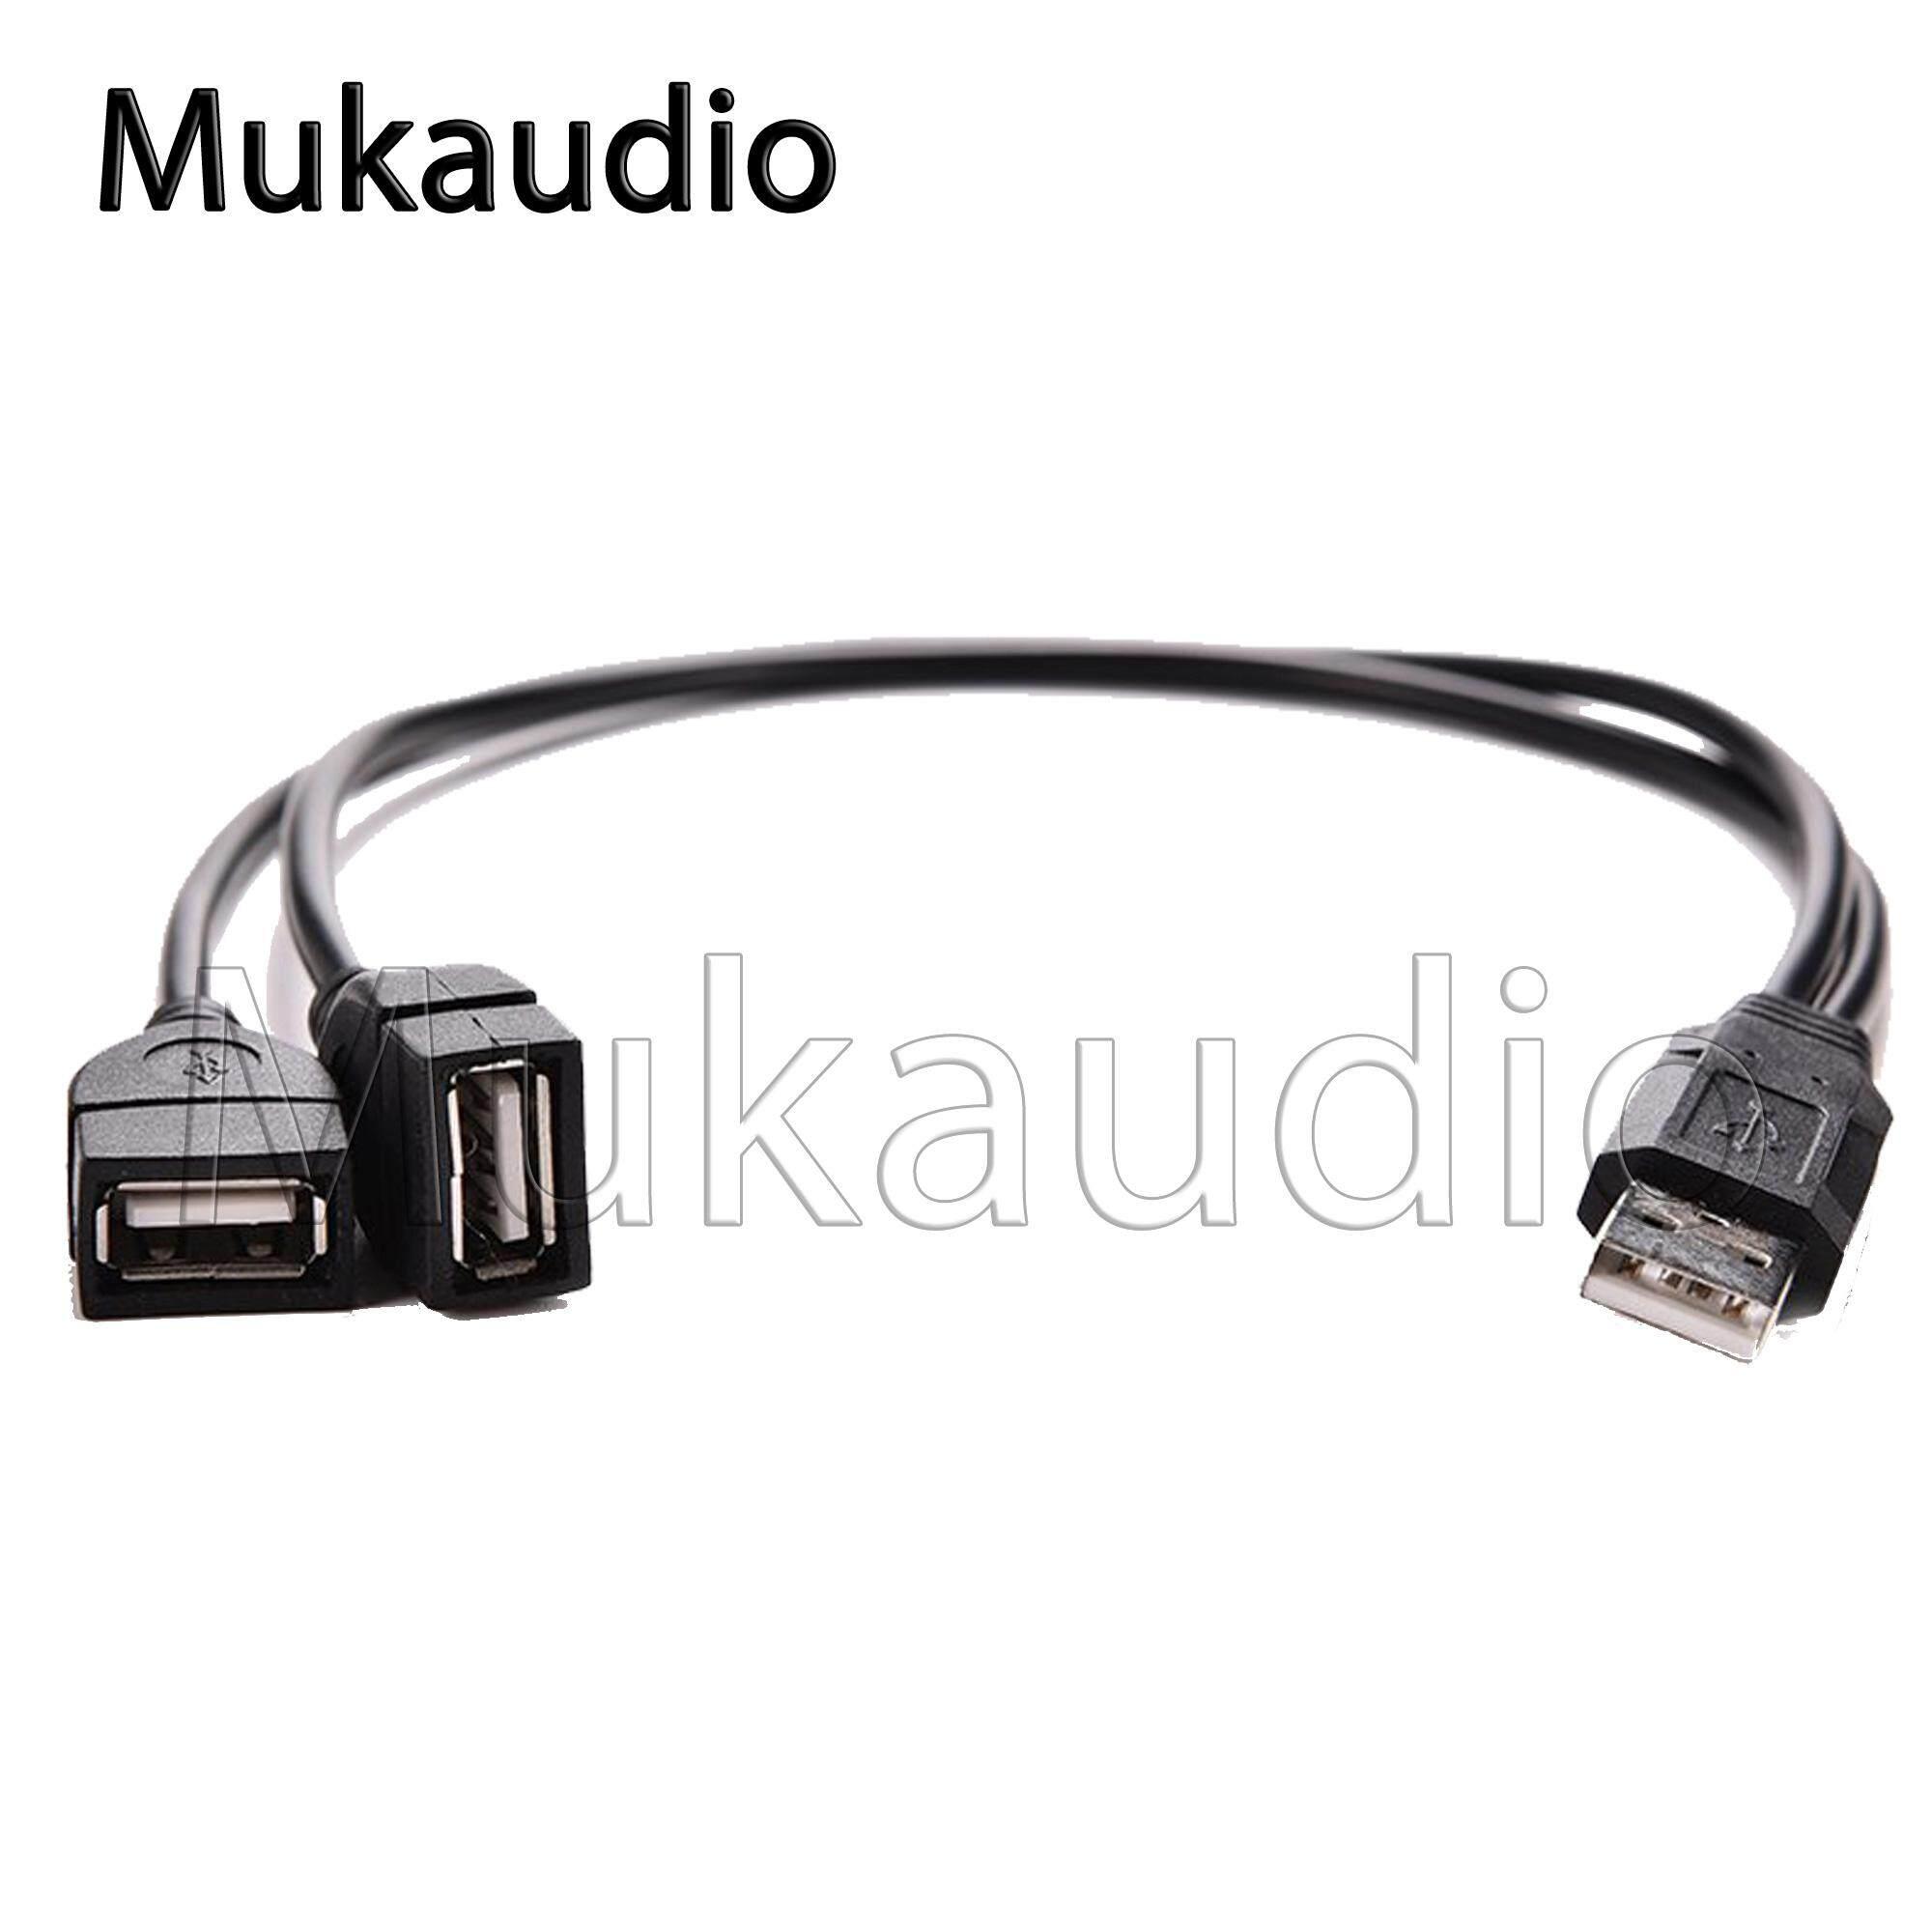 Usb 2.0 แจ็ค Usb2 คู่ ออก 2 Port Y Splitter Hub อะแดปเตอร์สายไฟ (สีดำ) By Mukaudio.